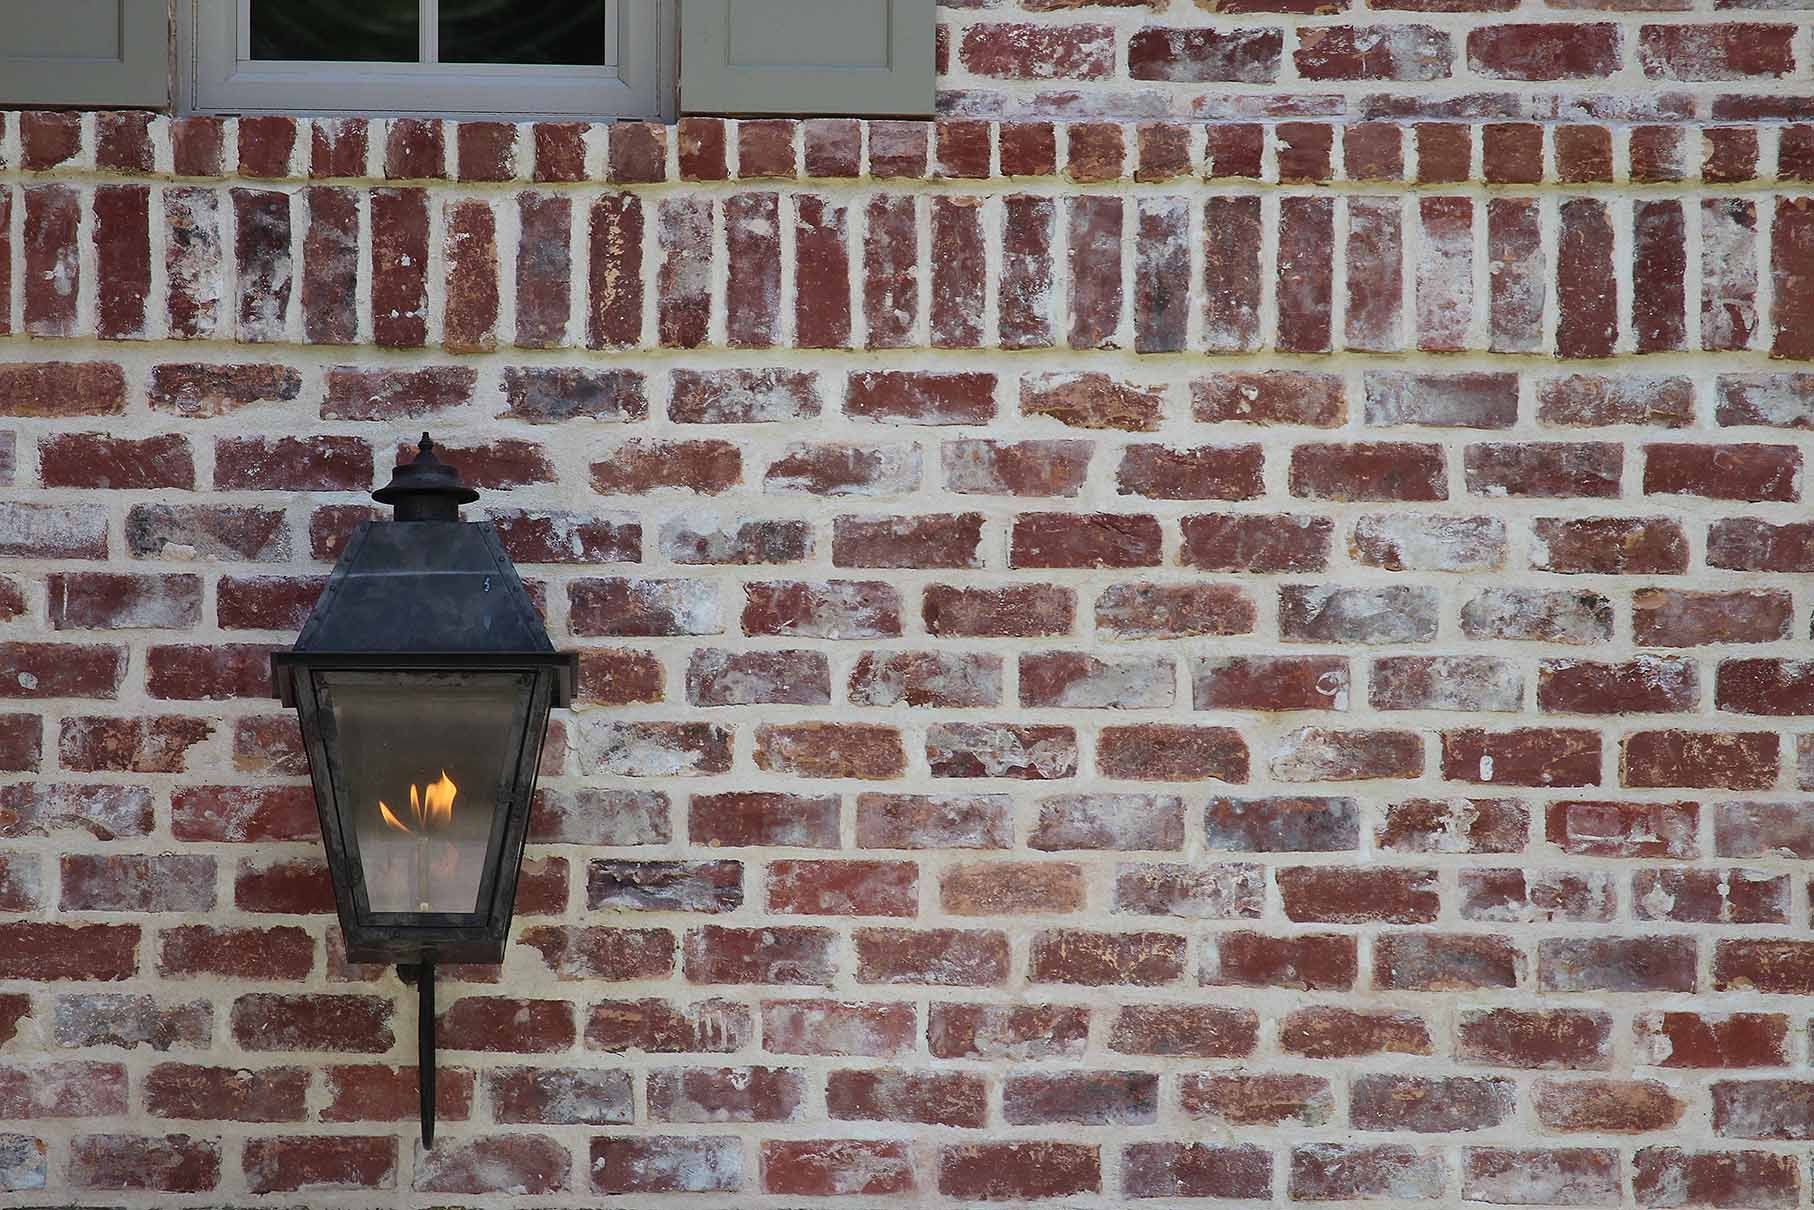 Old Texas Brick Red Brick House Exterior Brick Exterior House Painted Brick Exteriors